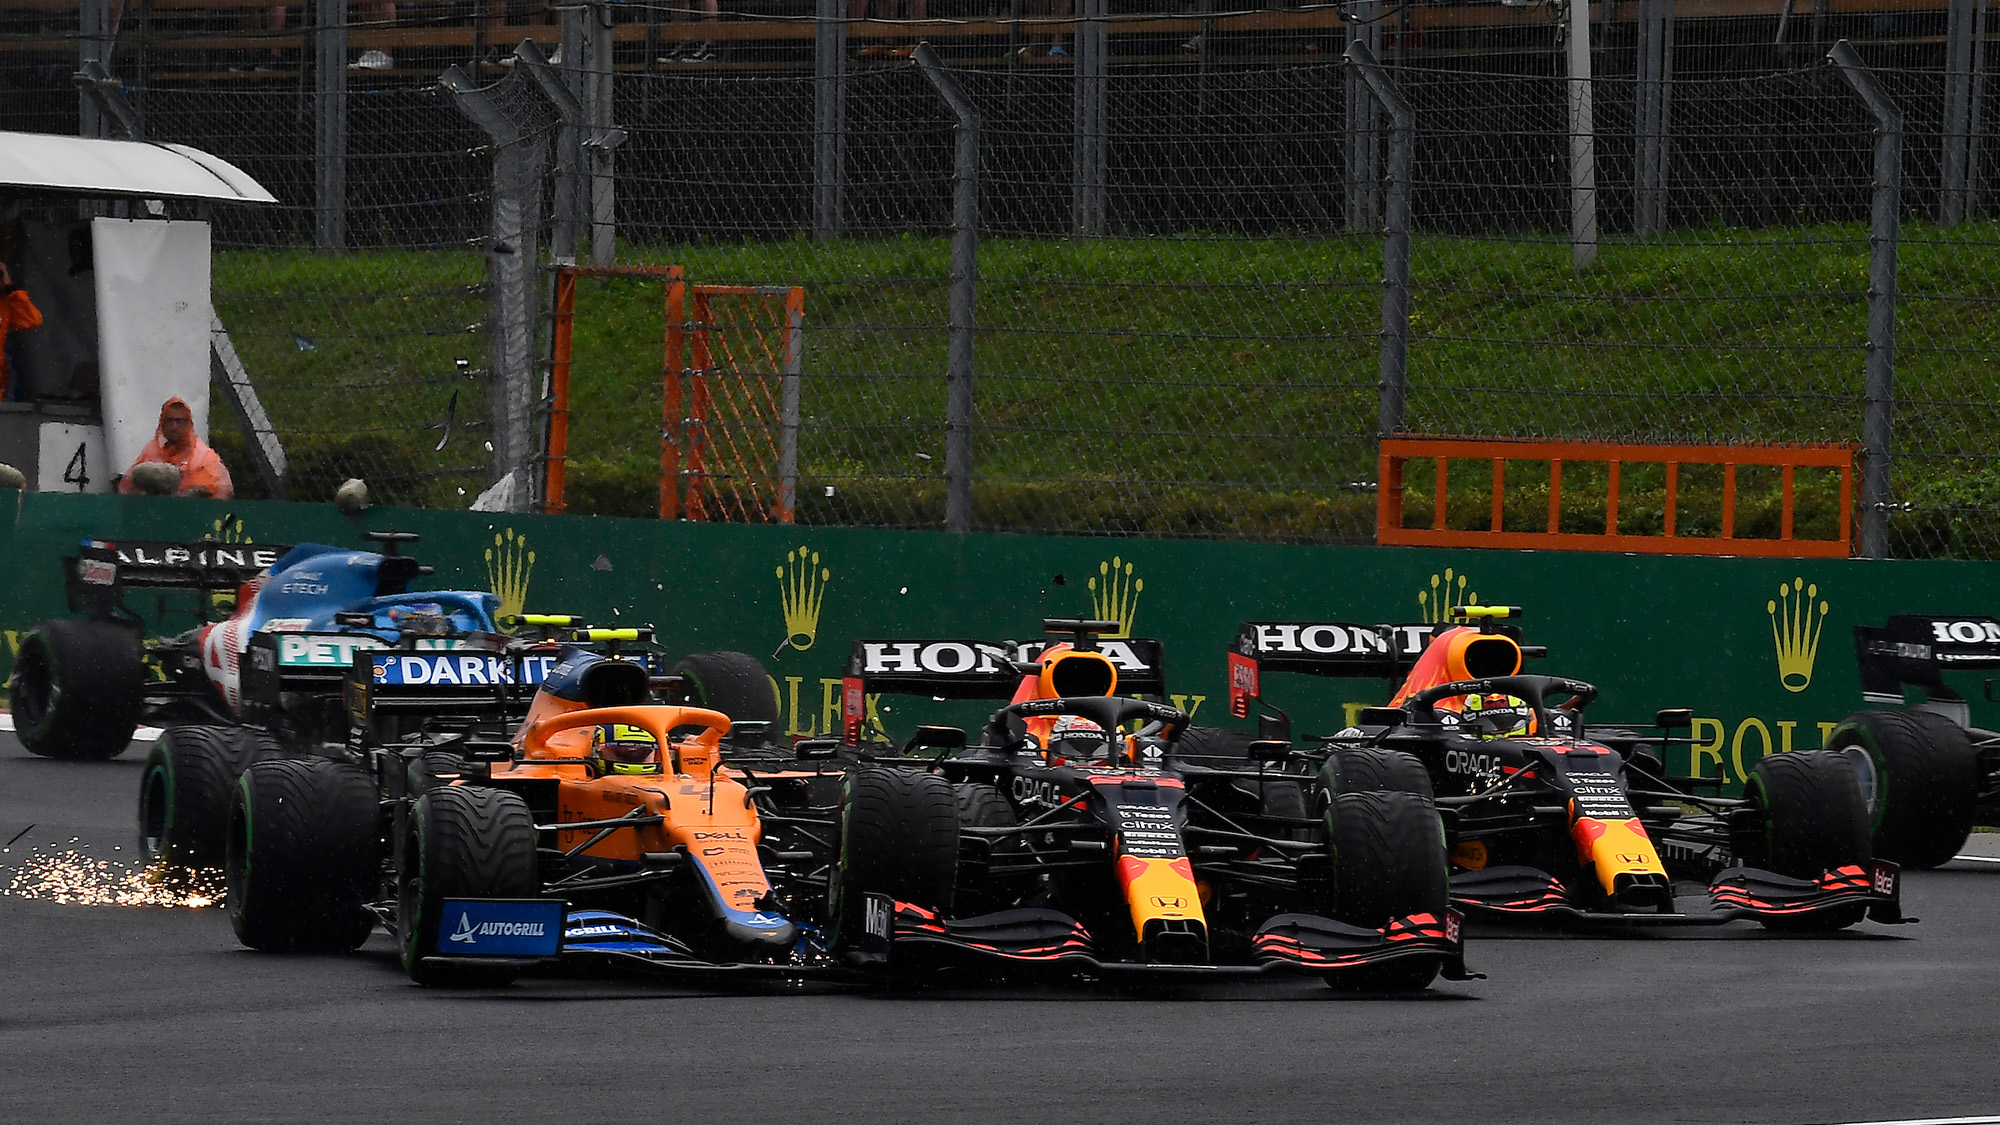 First corner crash at the 2021 Hungarian Grand Prix